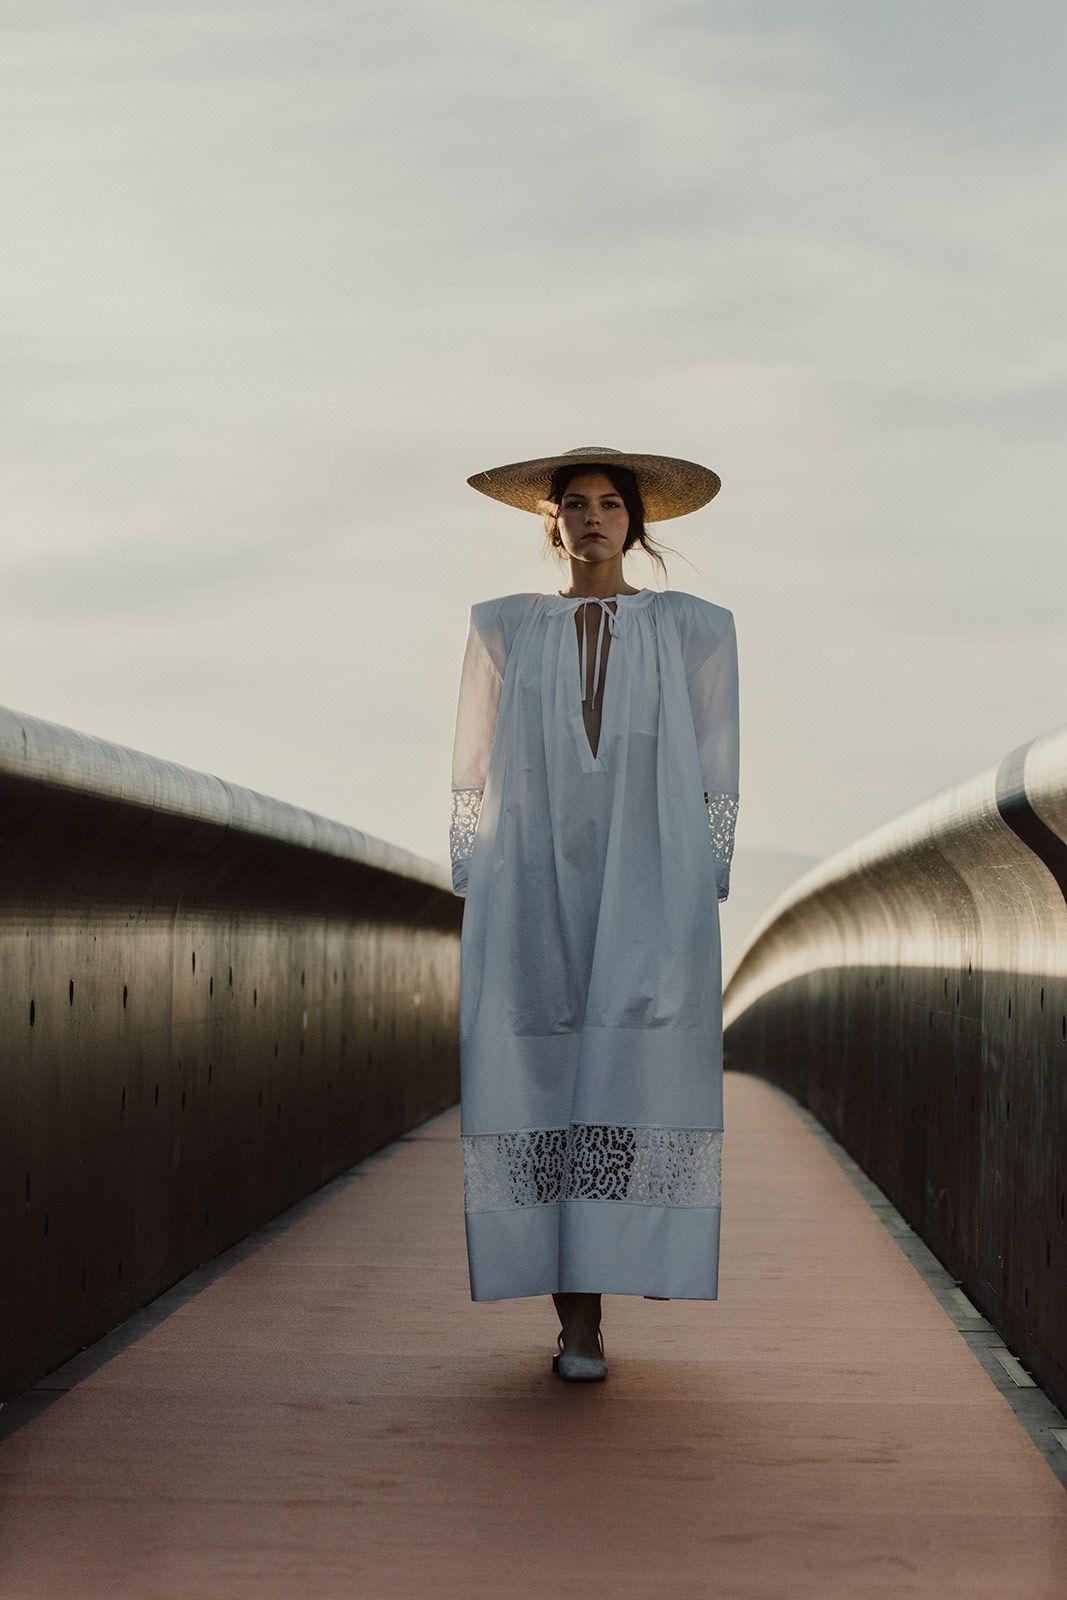 Jacquemus Espanol Metal Magazine Editoriales De Moda Fotos De Moda Moda